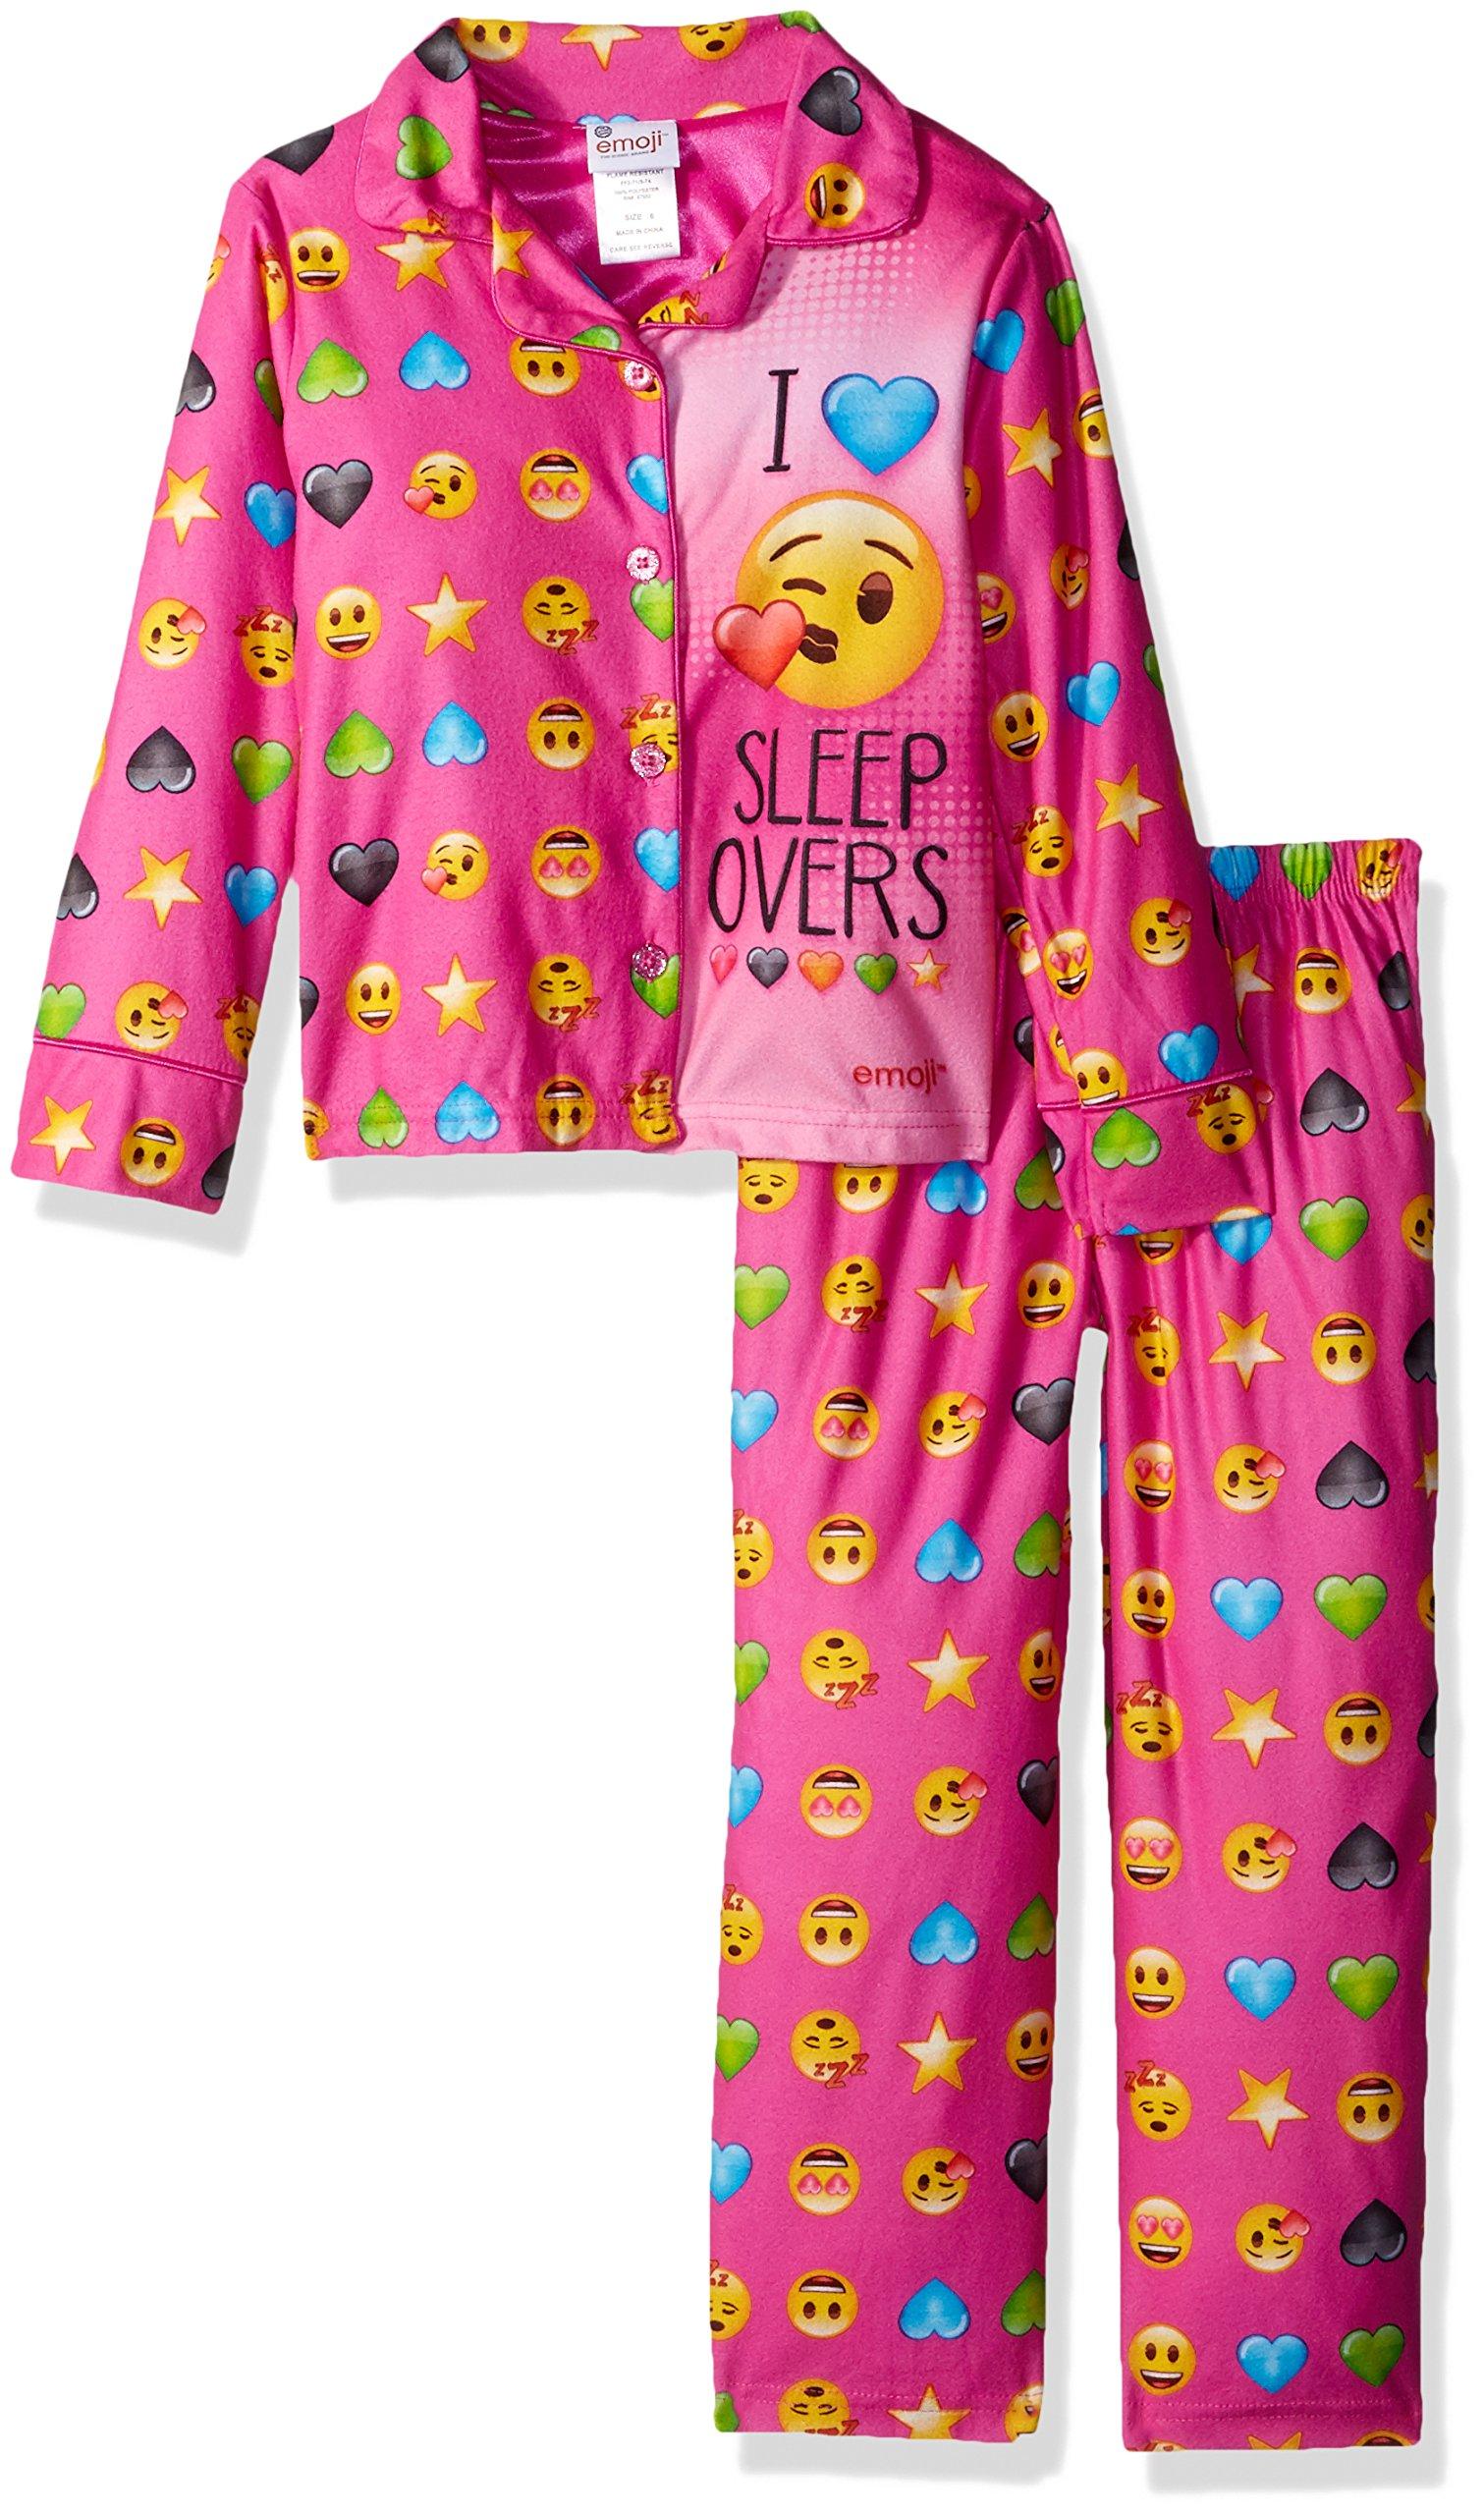 emoji Little Girls' Officially Branded 2-Piece Pajama Coat Set, Pink, 4